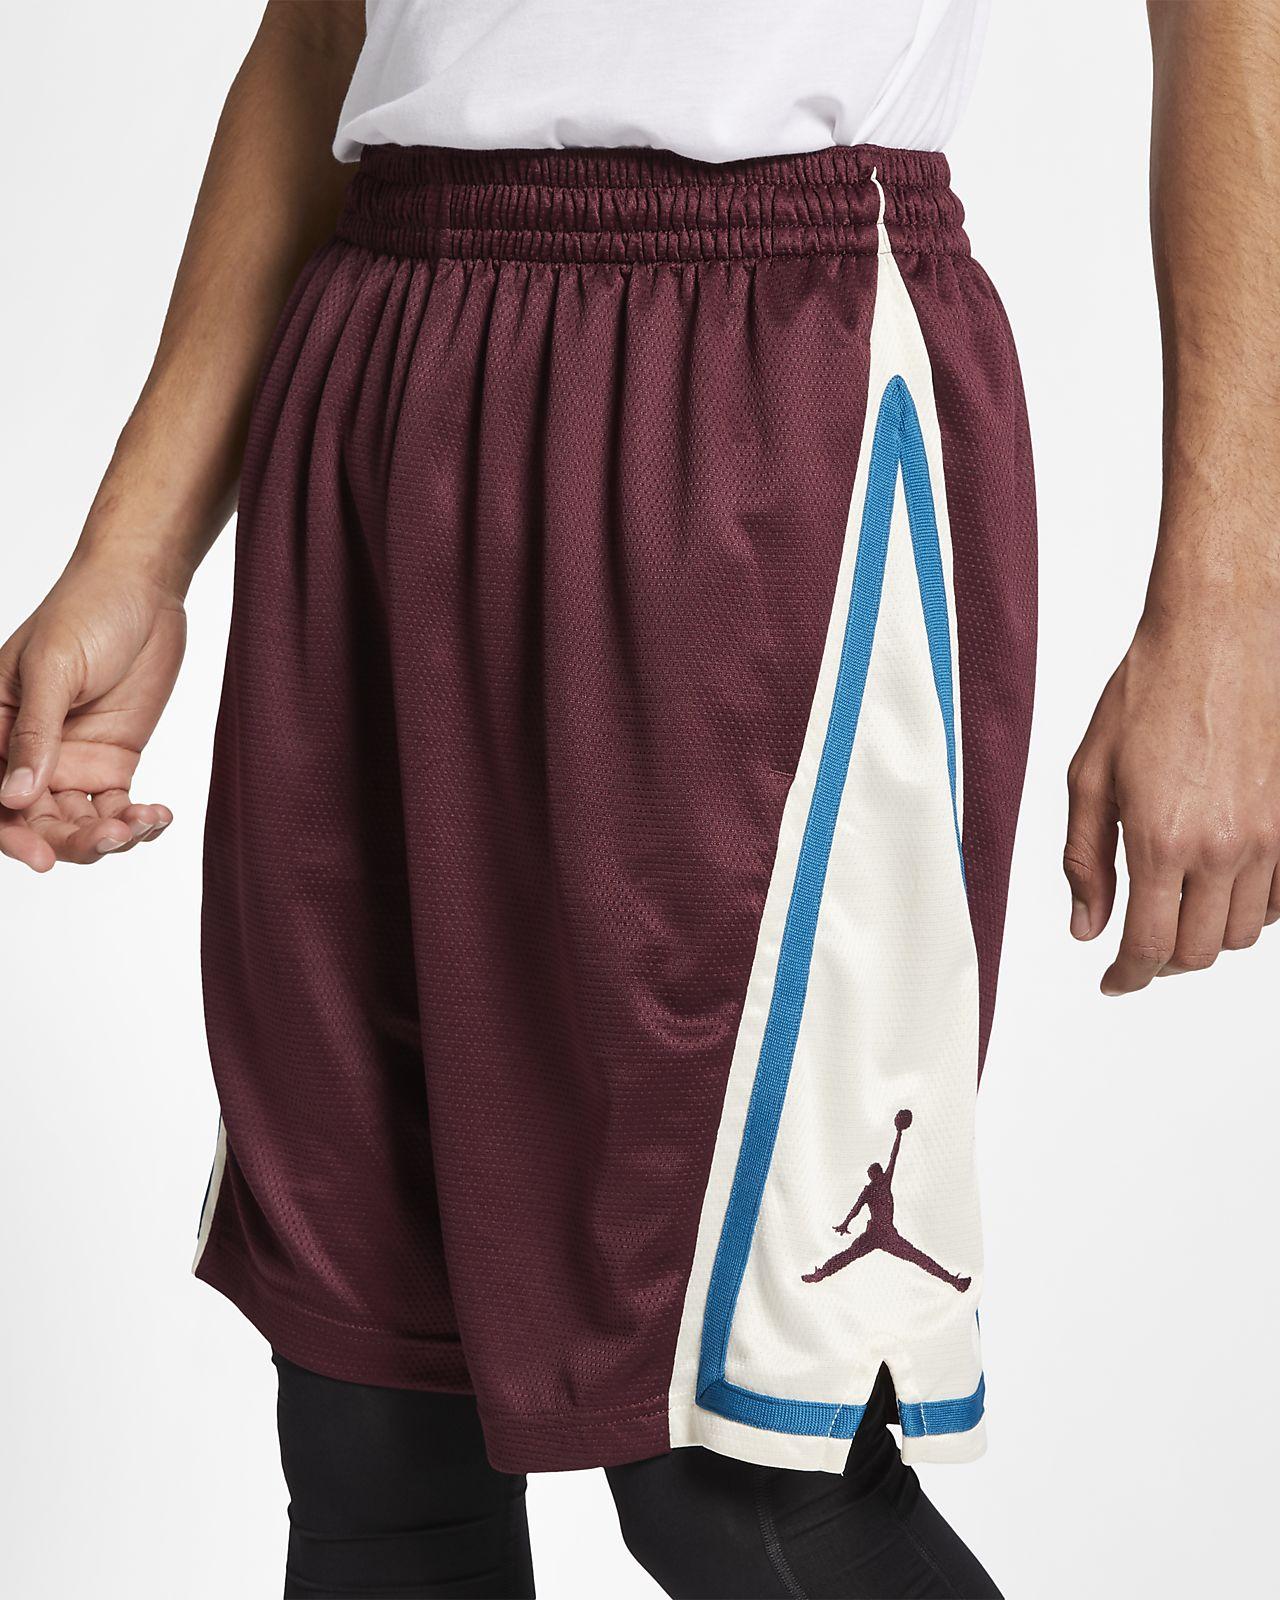 Shorts de básquetbol para hombre Jordan Franchise